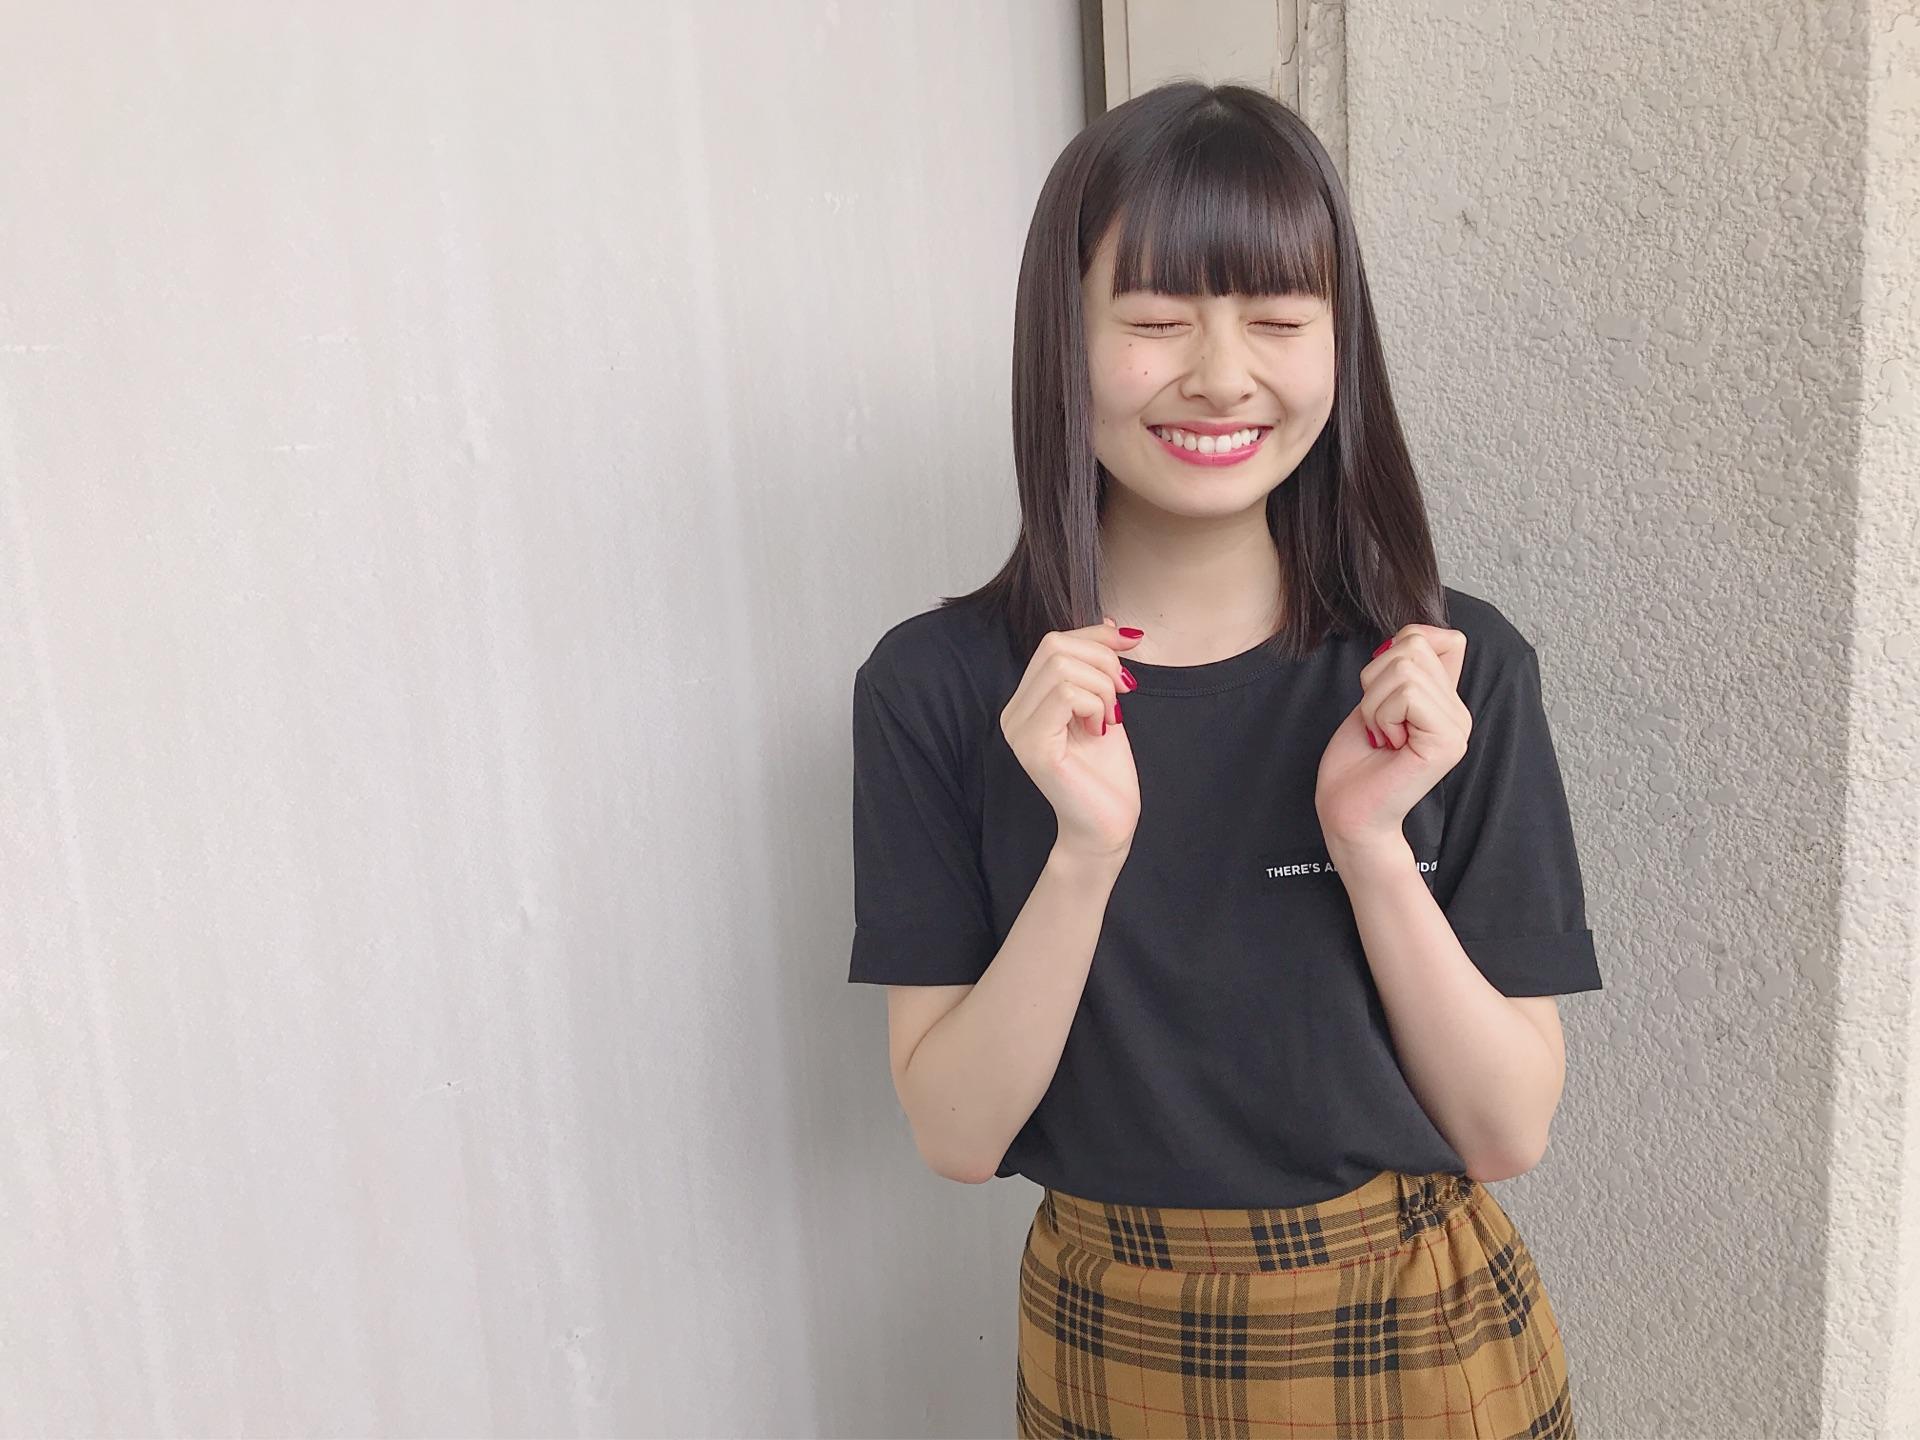 【HKT48】松岡はな応援スレ☆12【はな】YouTube動画>64本 ->画像>341枚